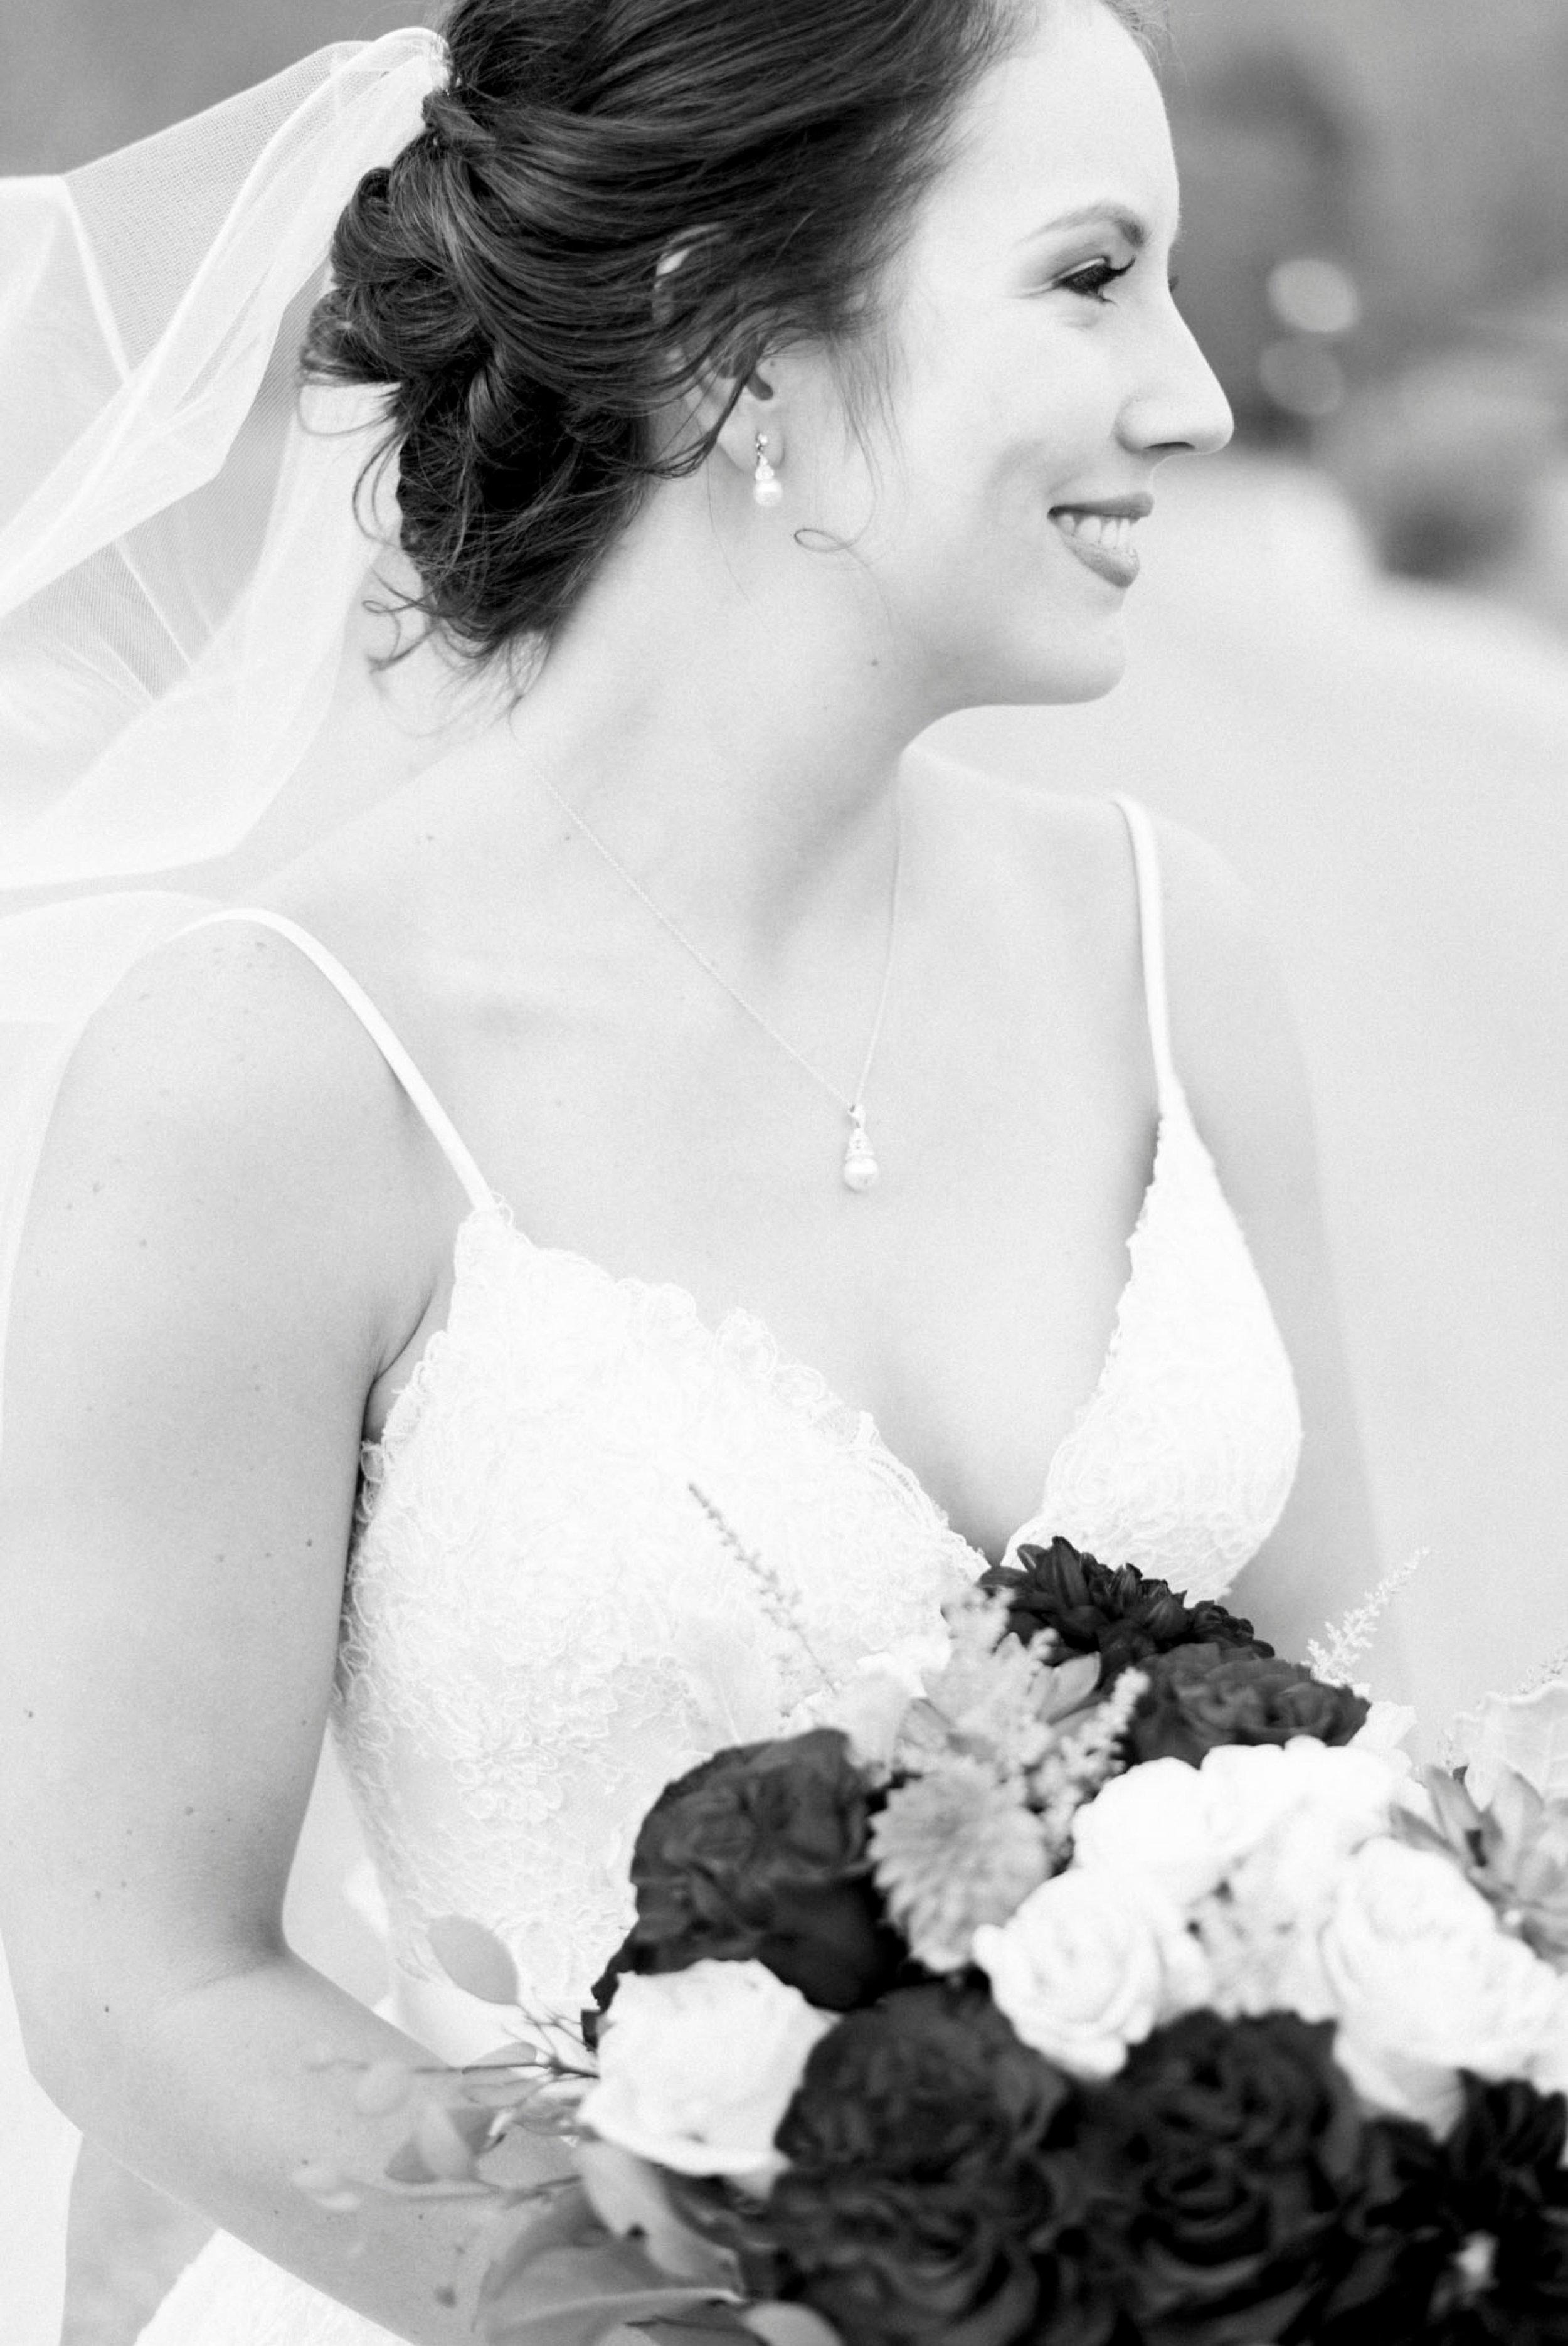 IrvineEstate_LexingtonVA_Wedding_FallWedding_VirginiaWeddingPhotographer 46.jpg